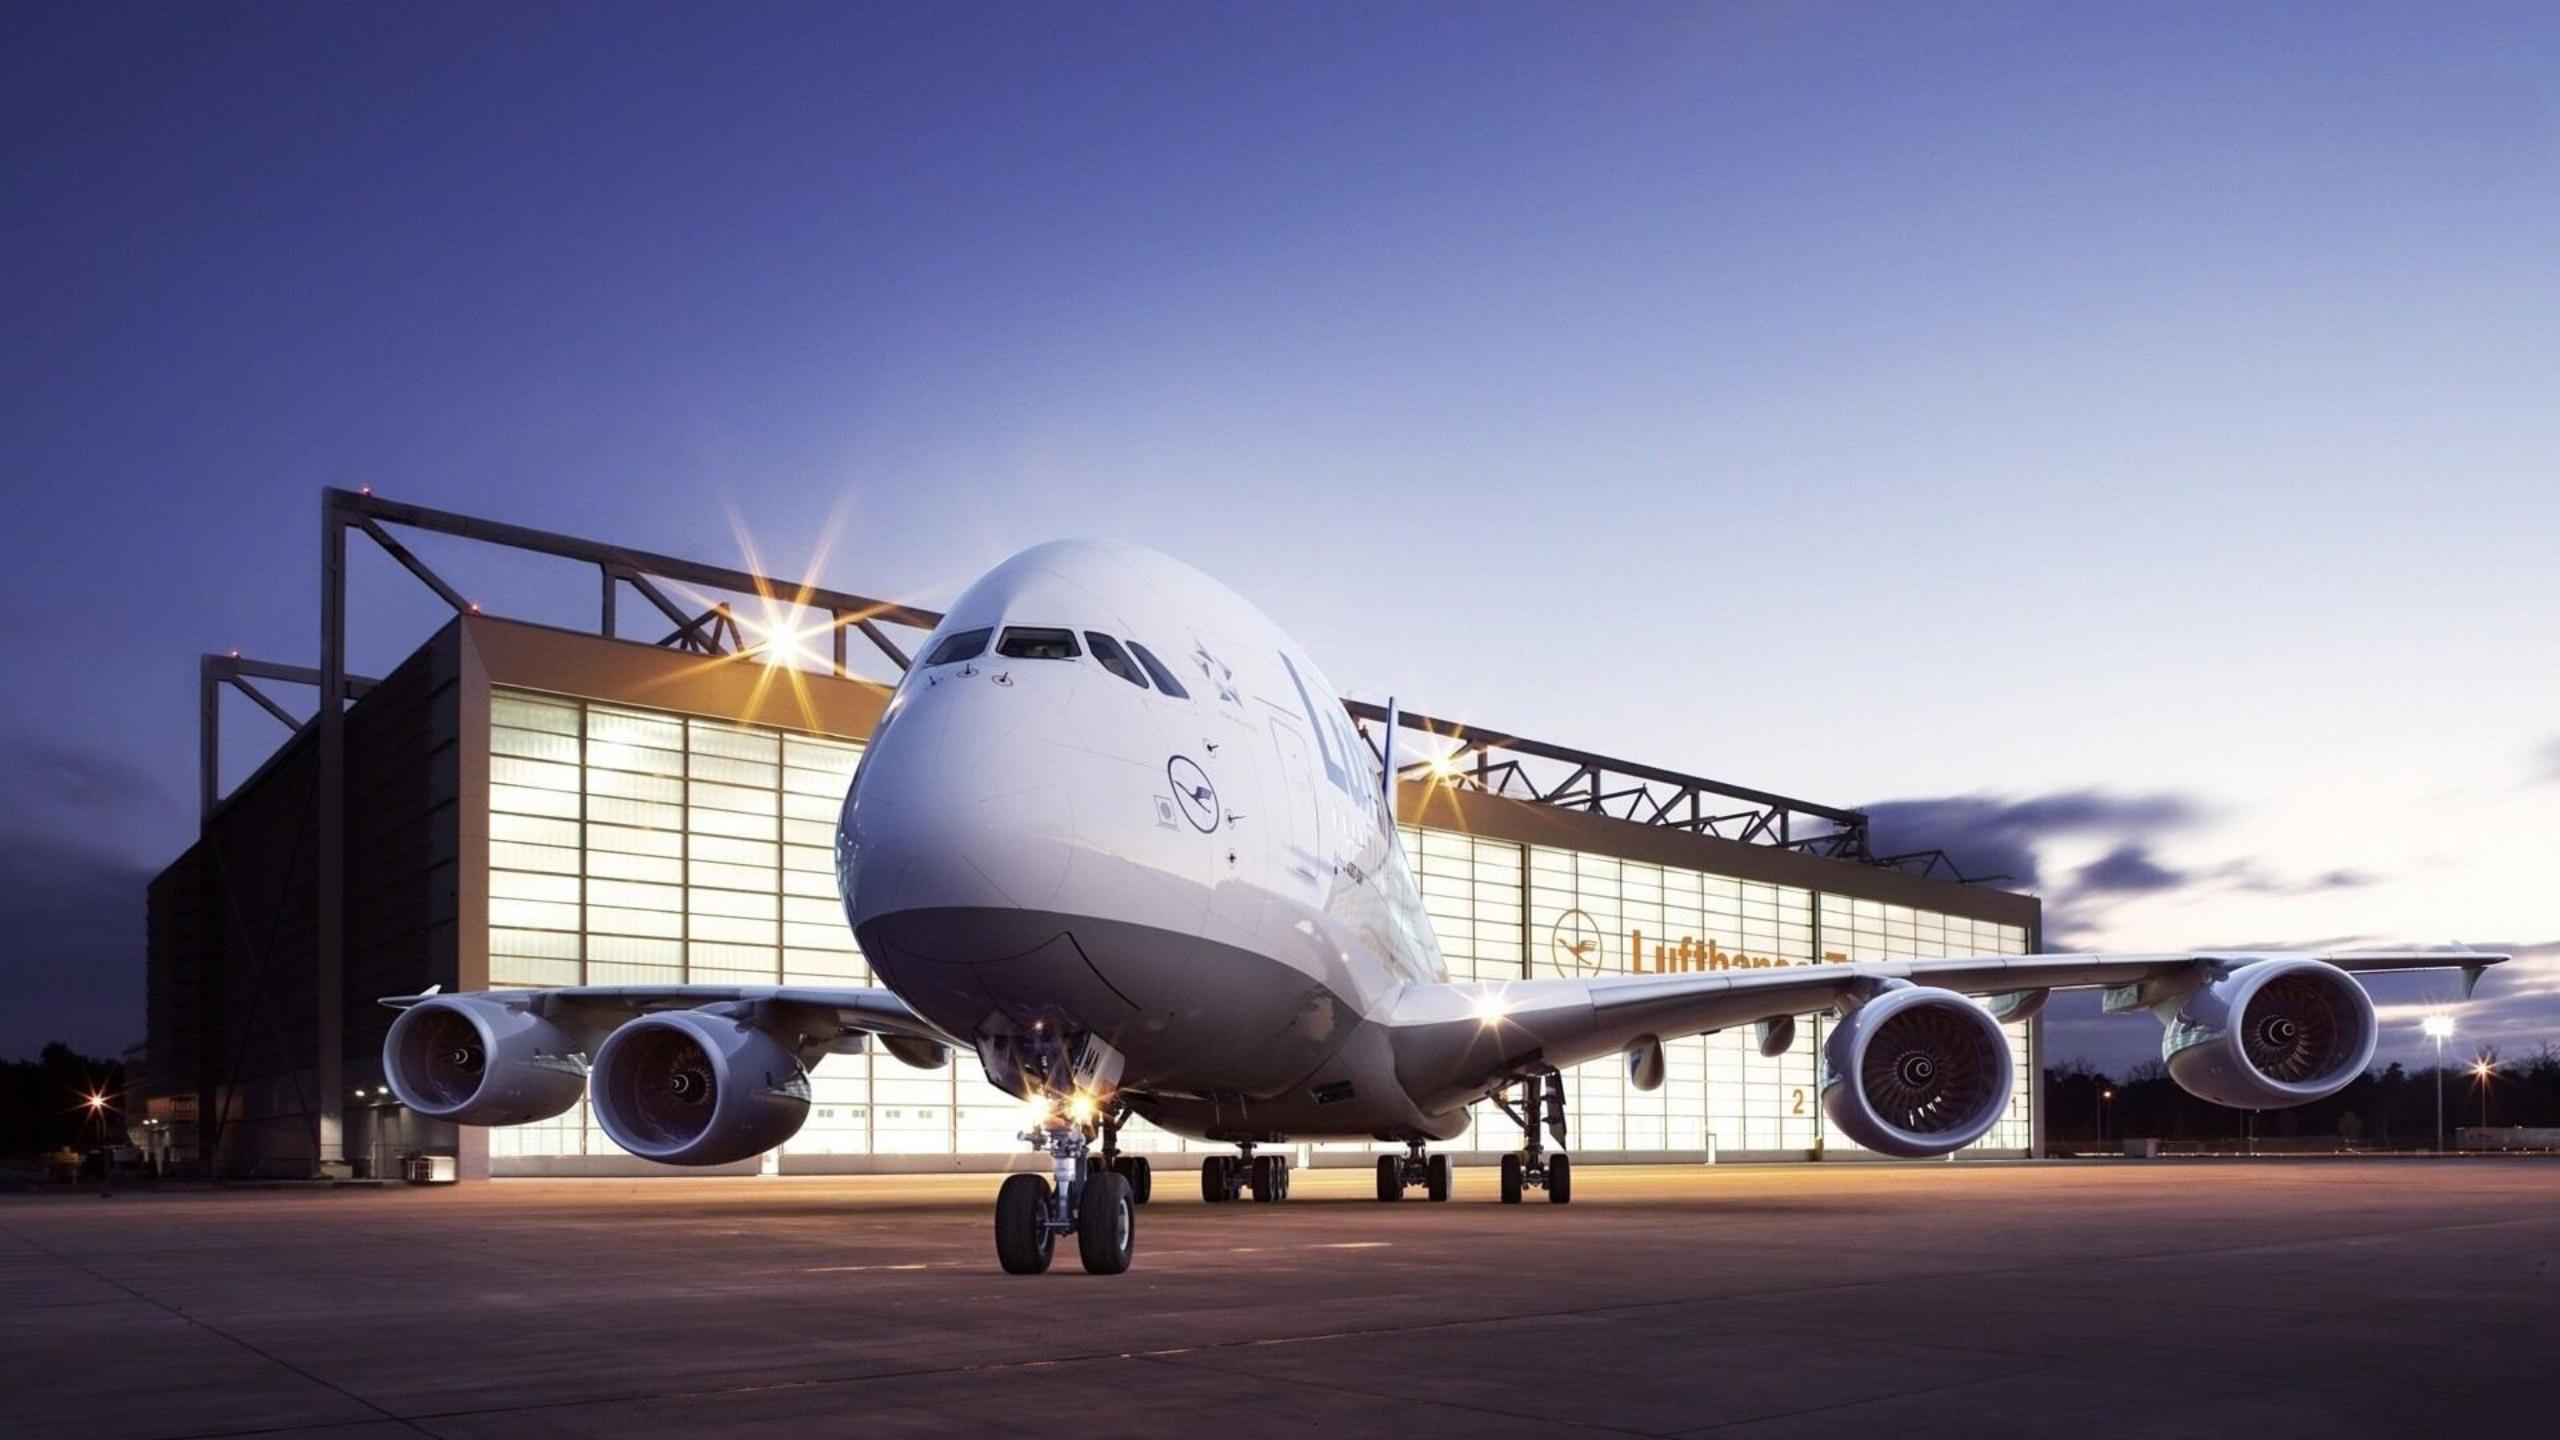 Обои Lufthansa. Авиация foto 17